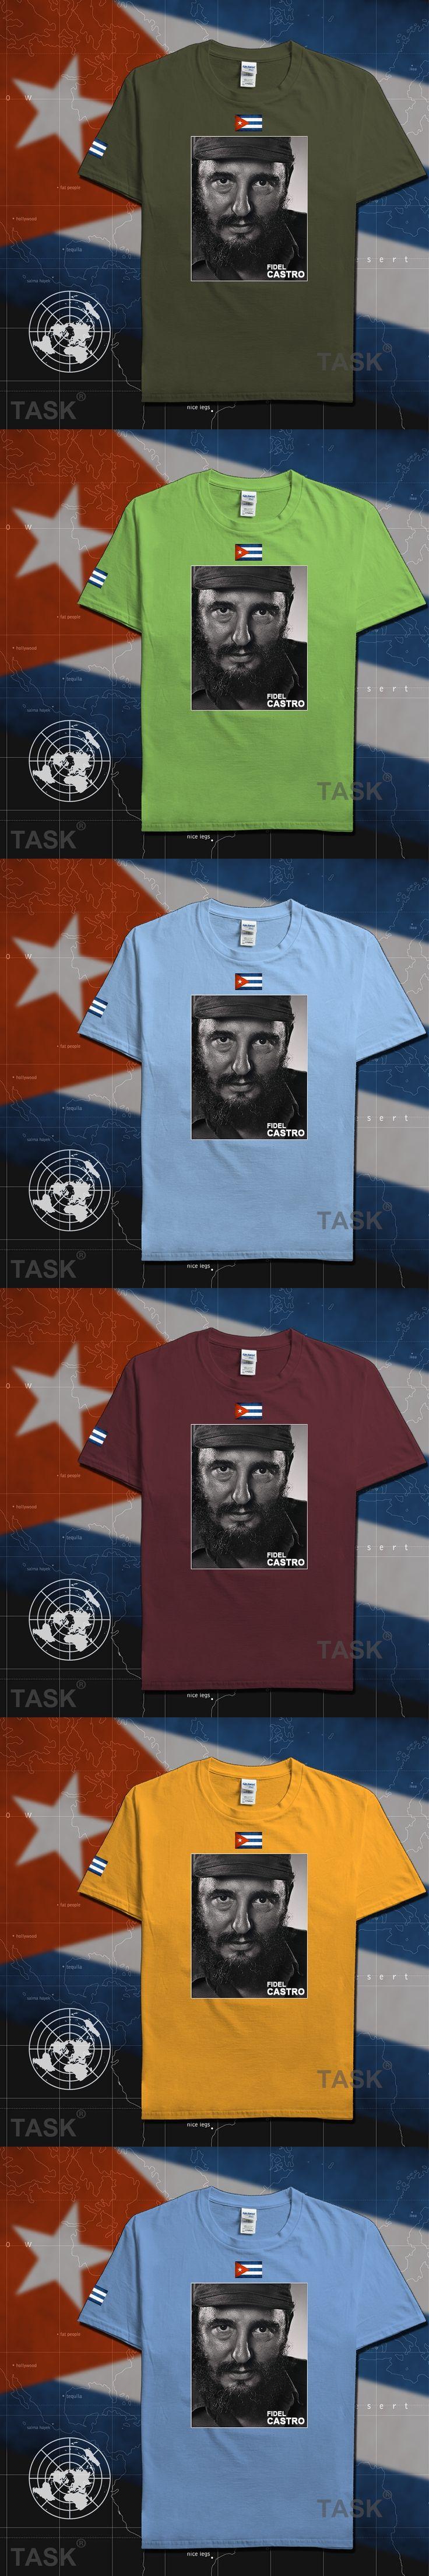 Fidel Castro President of Cuba Short Sleeve Casual Mens T Shirt tee souvenir t-shirt 100% cotton Men's 2017 Summer Fashion 05